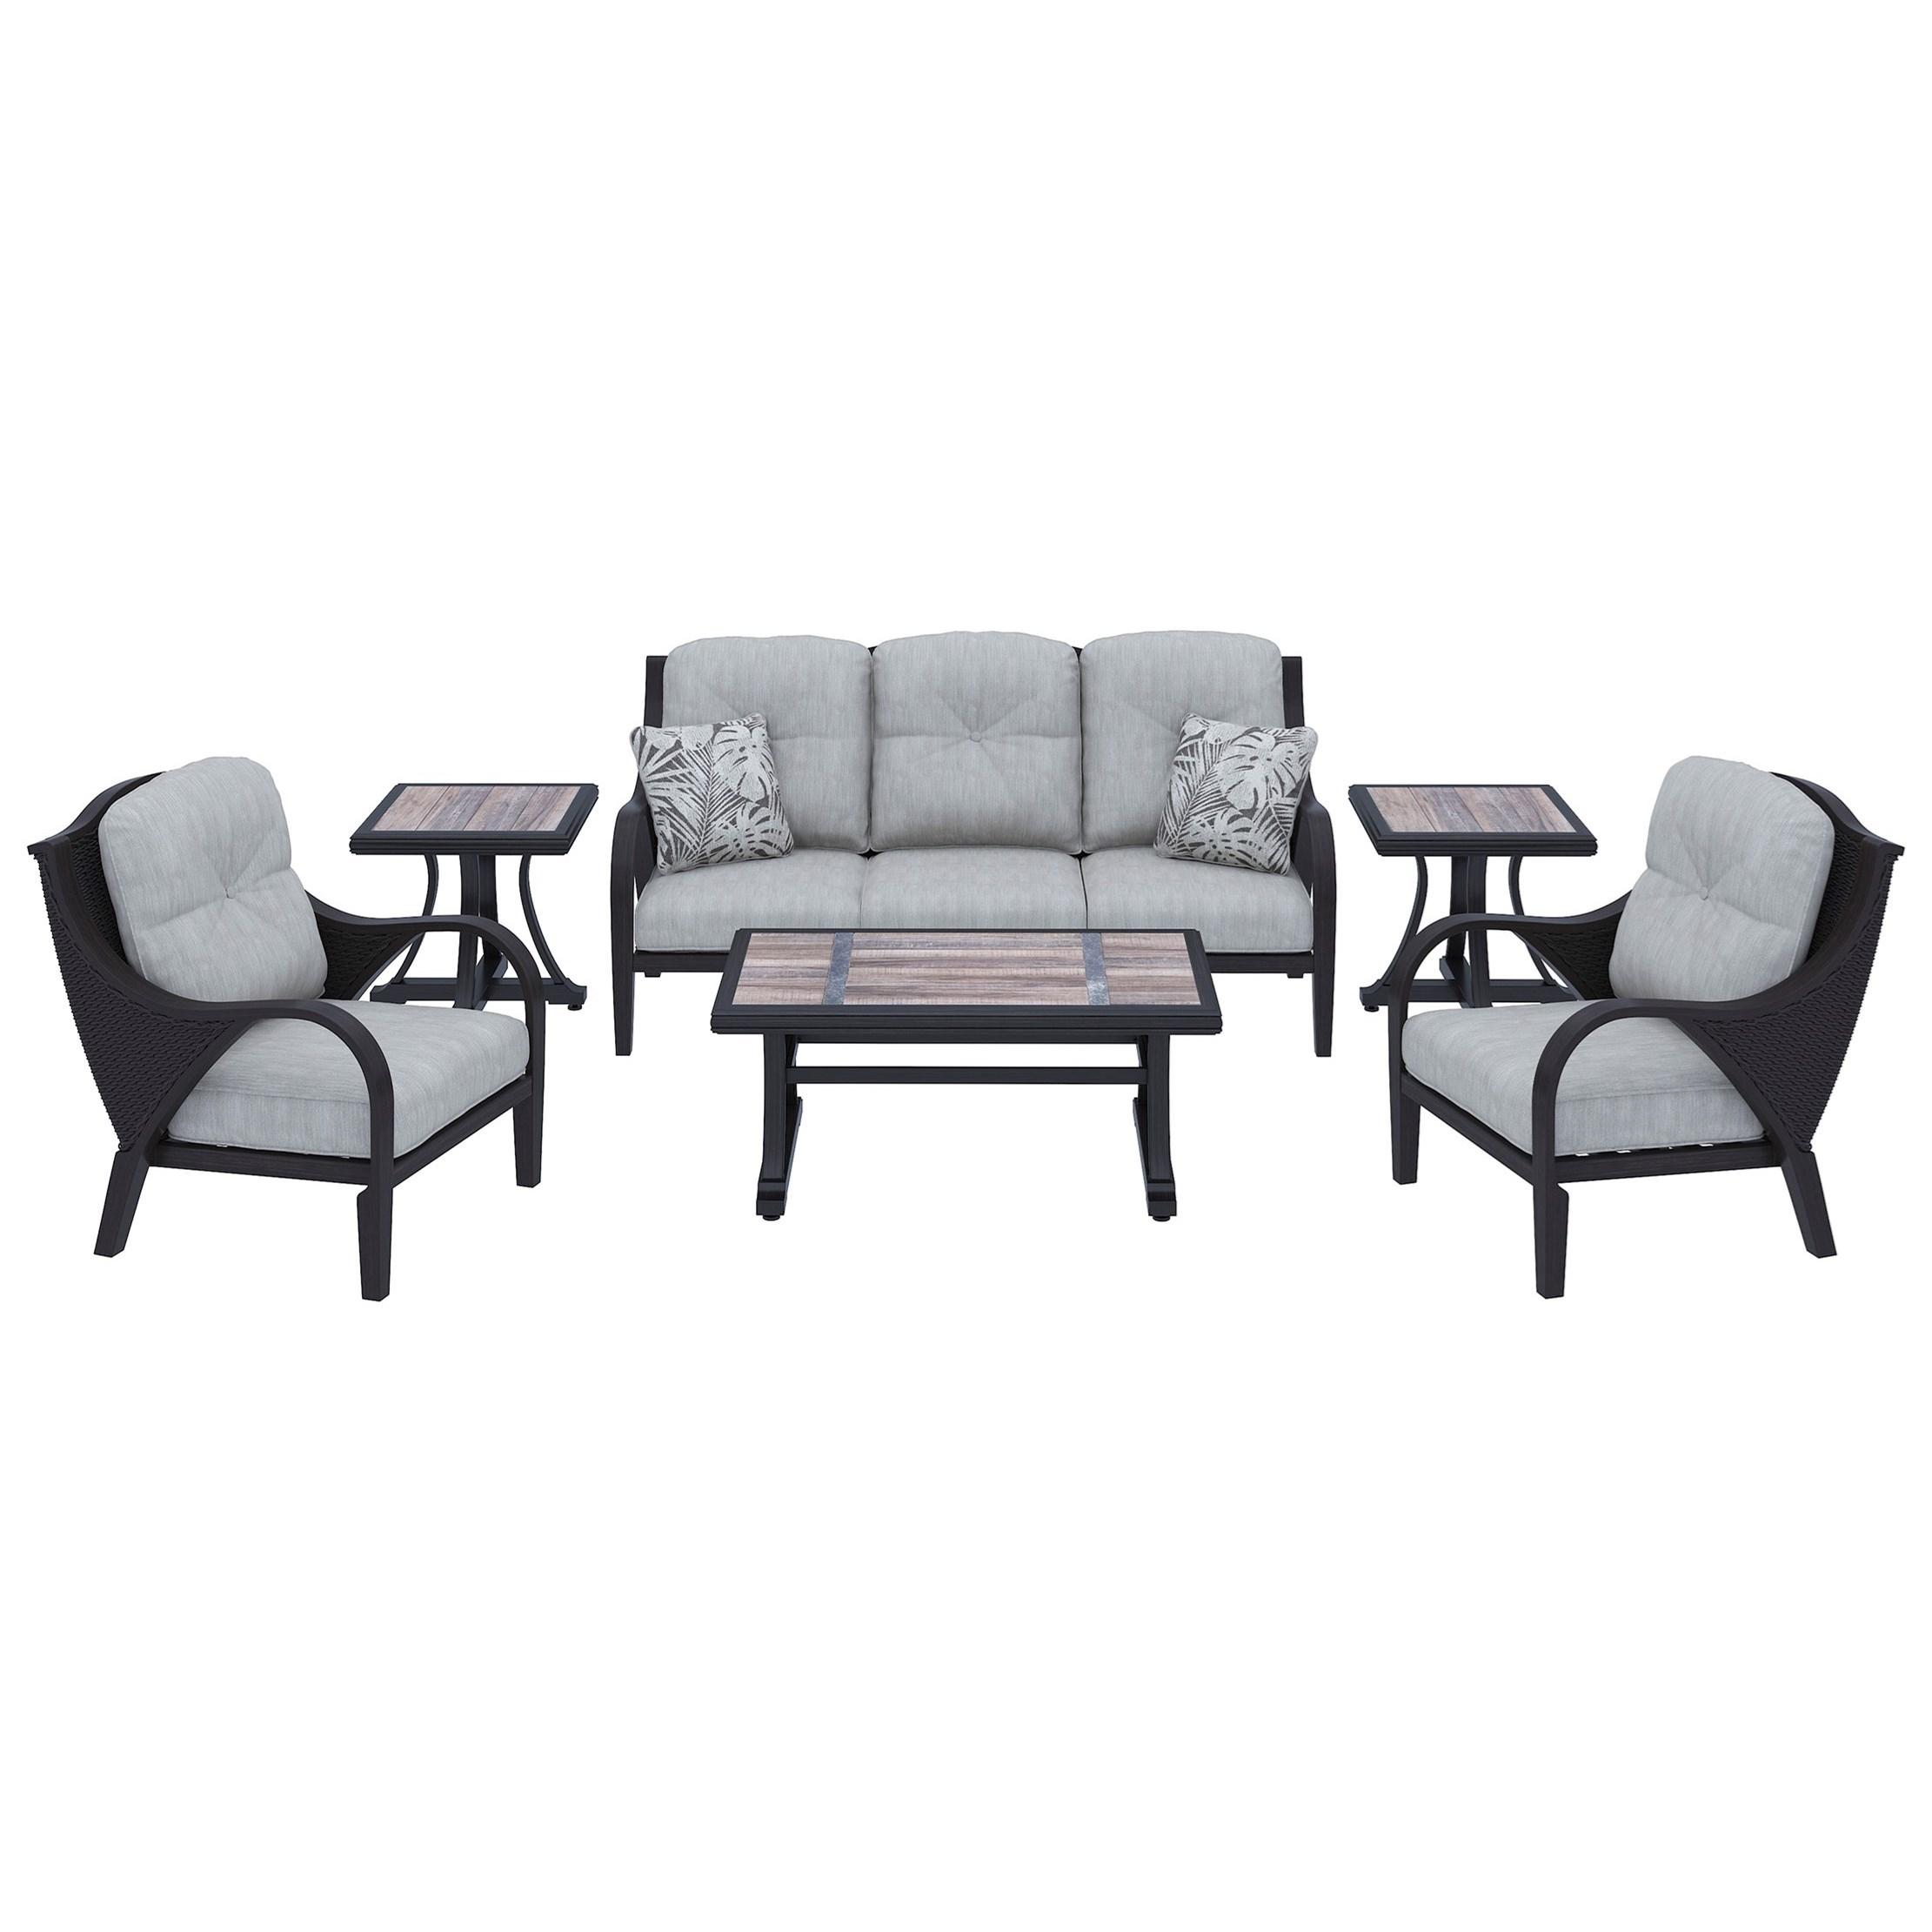 Marsh Creek Outdoor Conversation Set by Signature Design by Ashley at Lapeer Furniture & Mattress Center